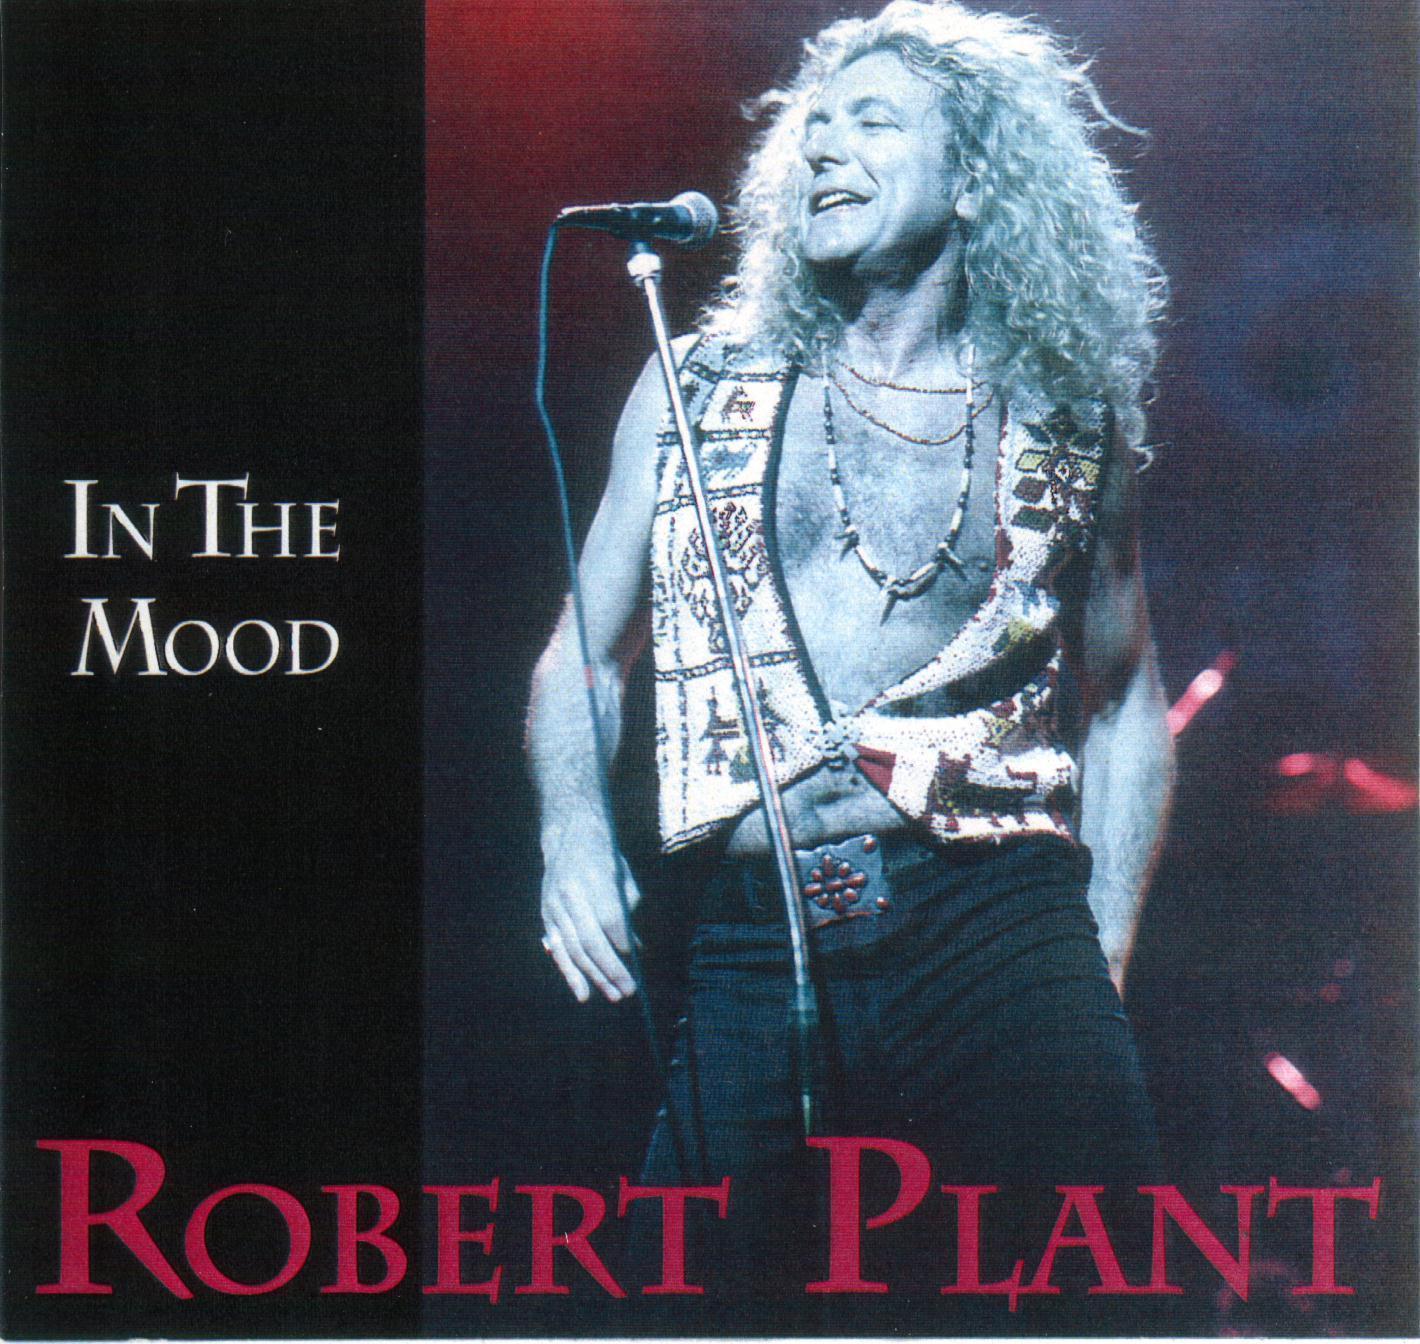 1993-robertplant-seattle-f.jpg